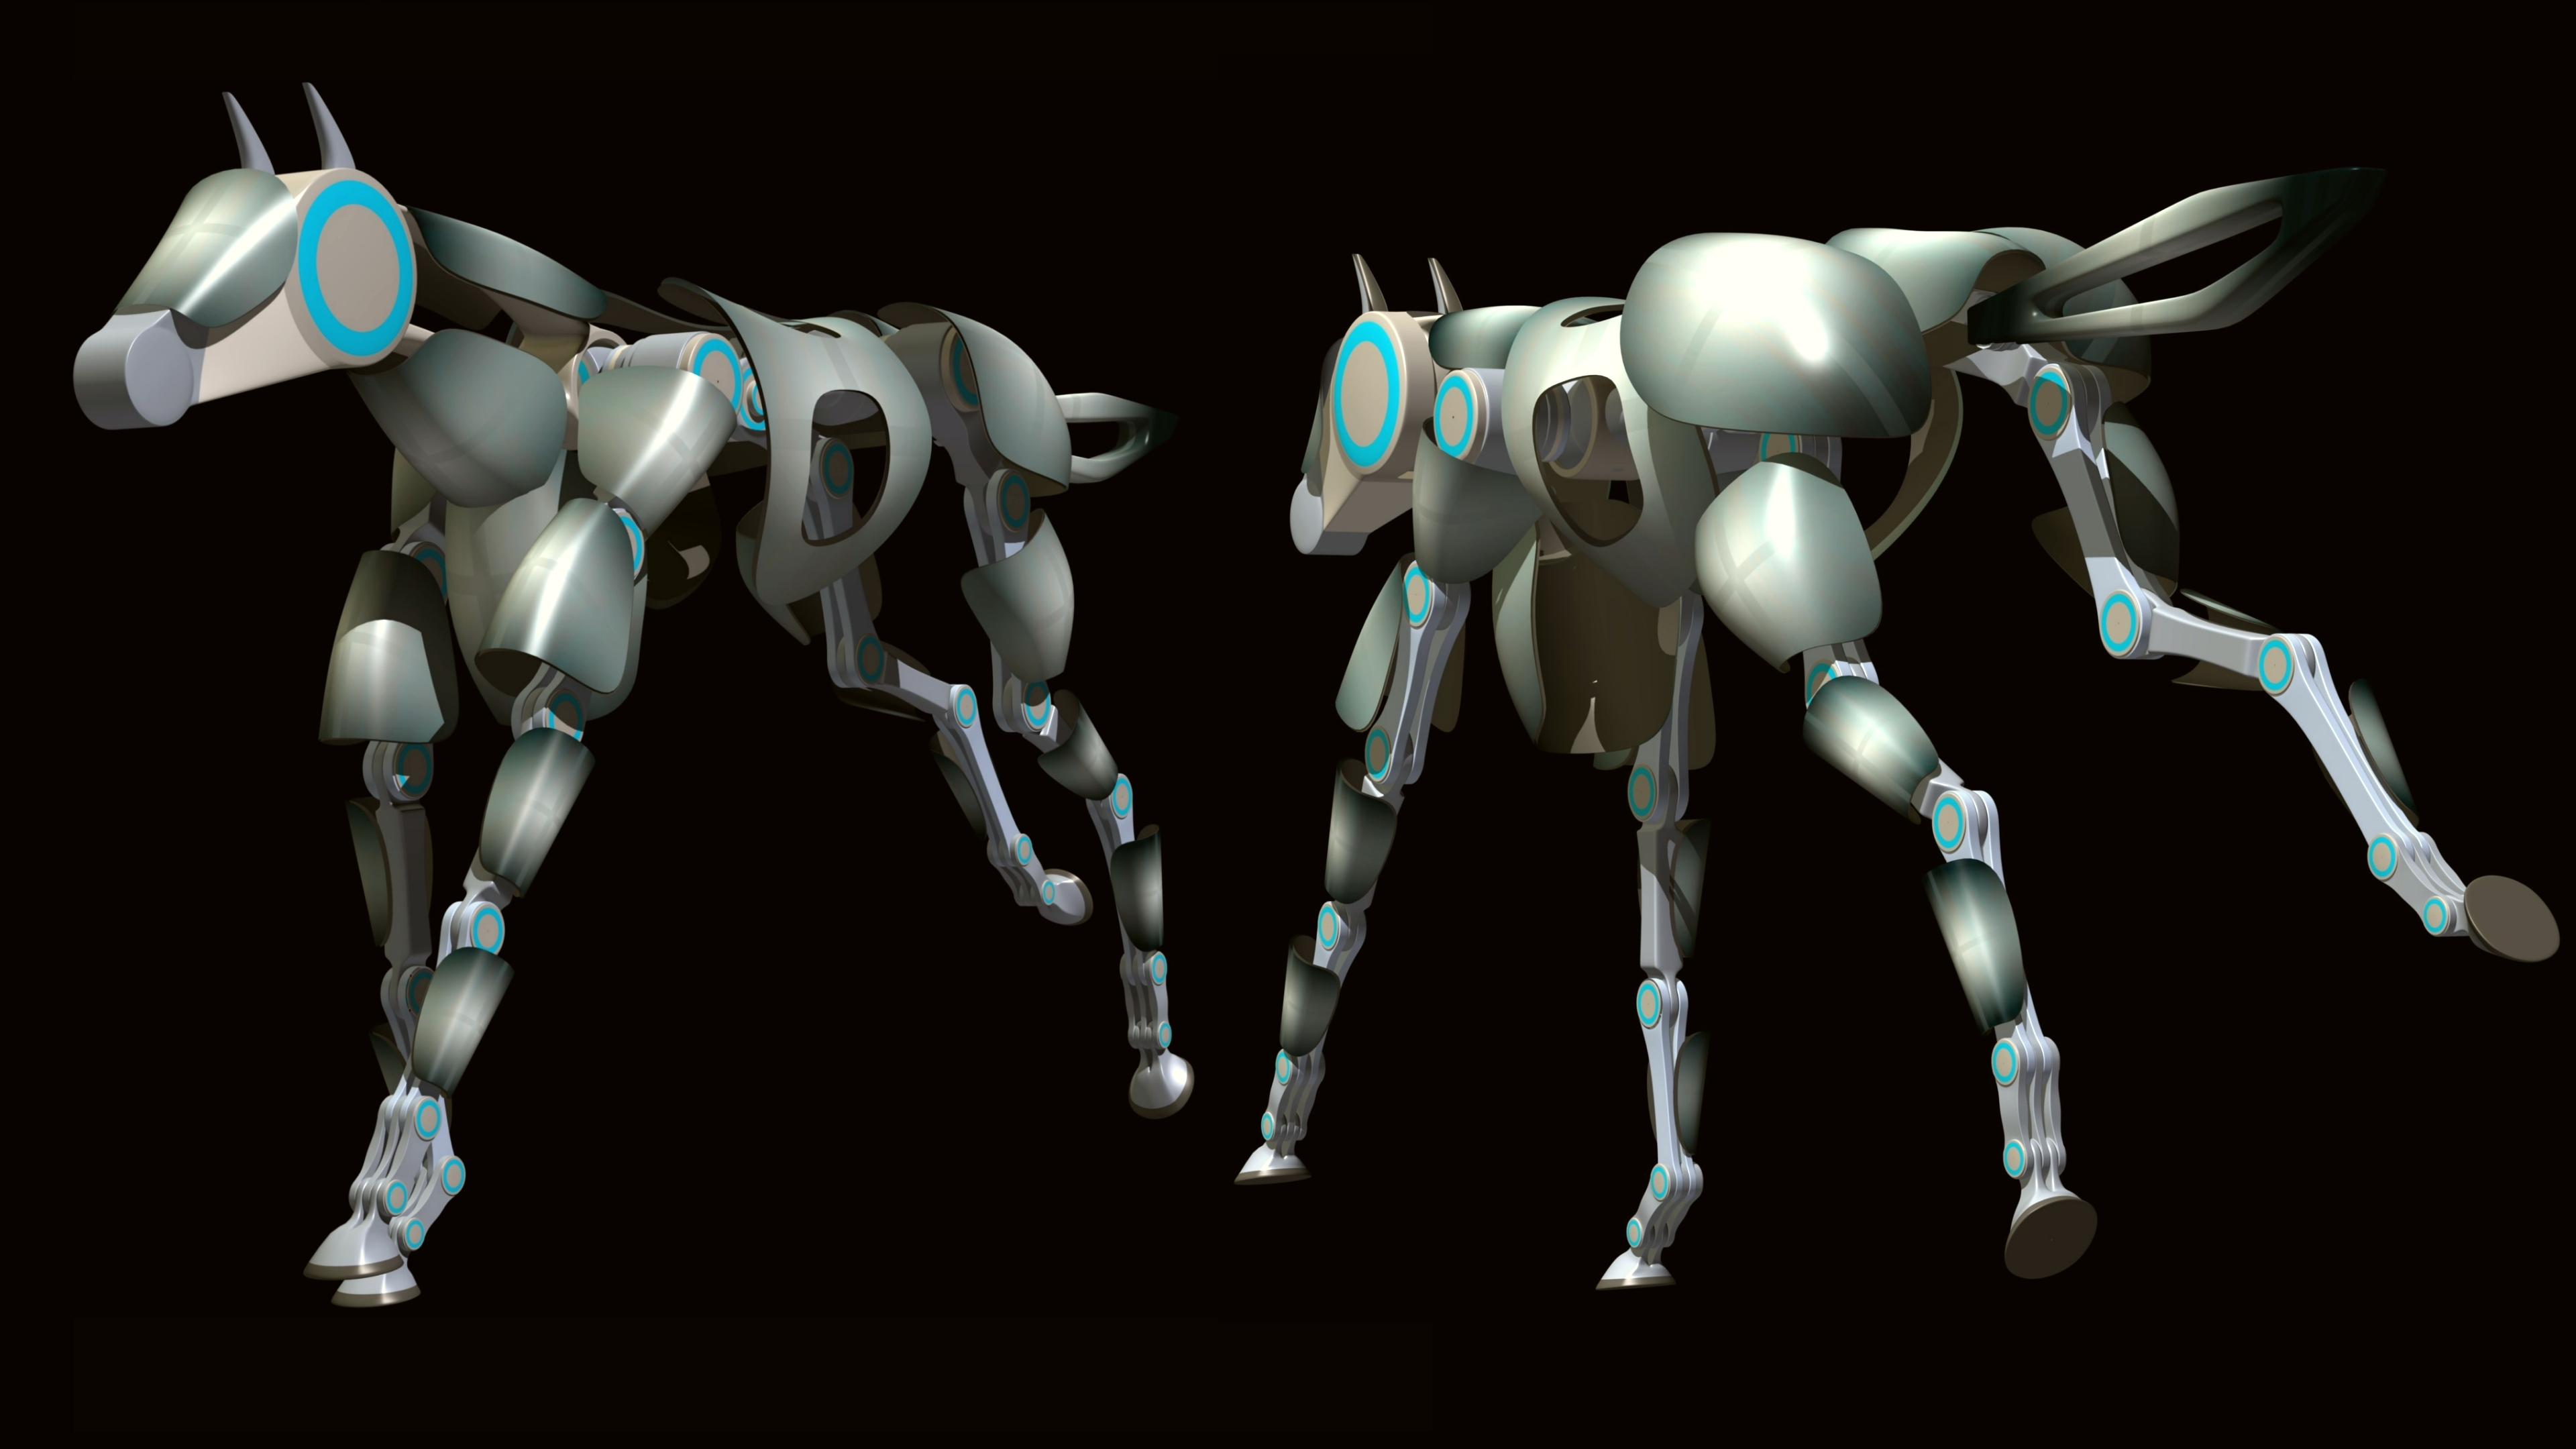 Deviantarts Robot Horse: Robotic Horse By Emigepa On DeviantArt